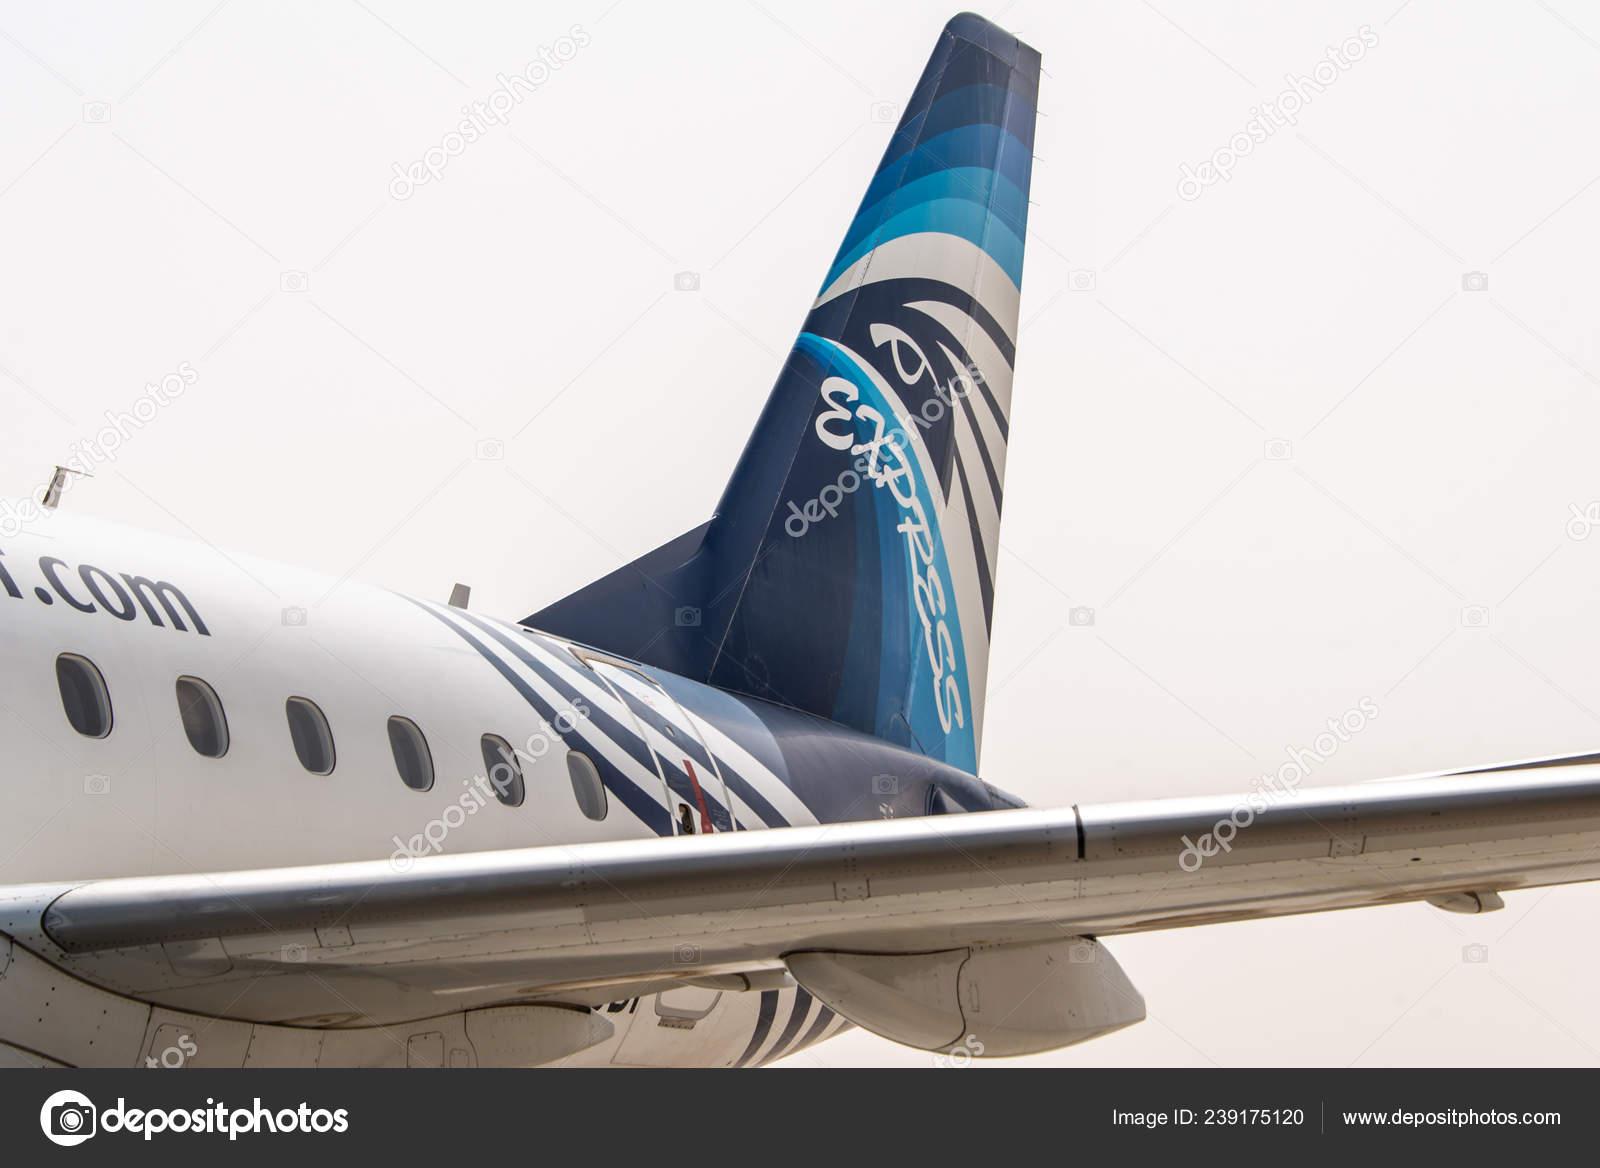 Обои ночь, Boeing 737, Самолёт, b737, tuifly, aircraft. Авиация foto 8